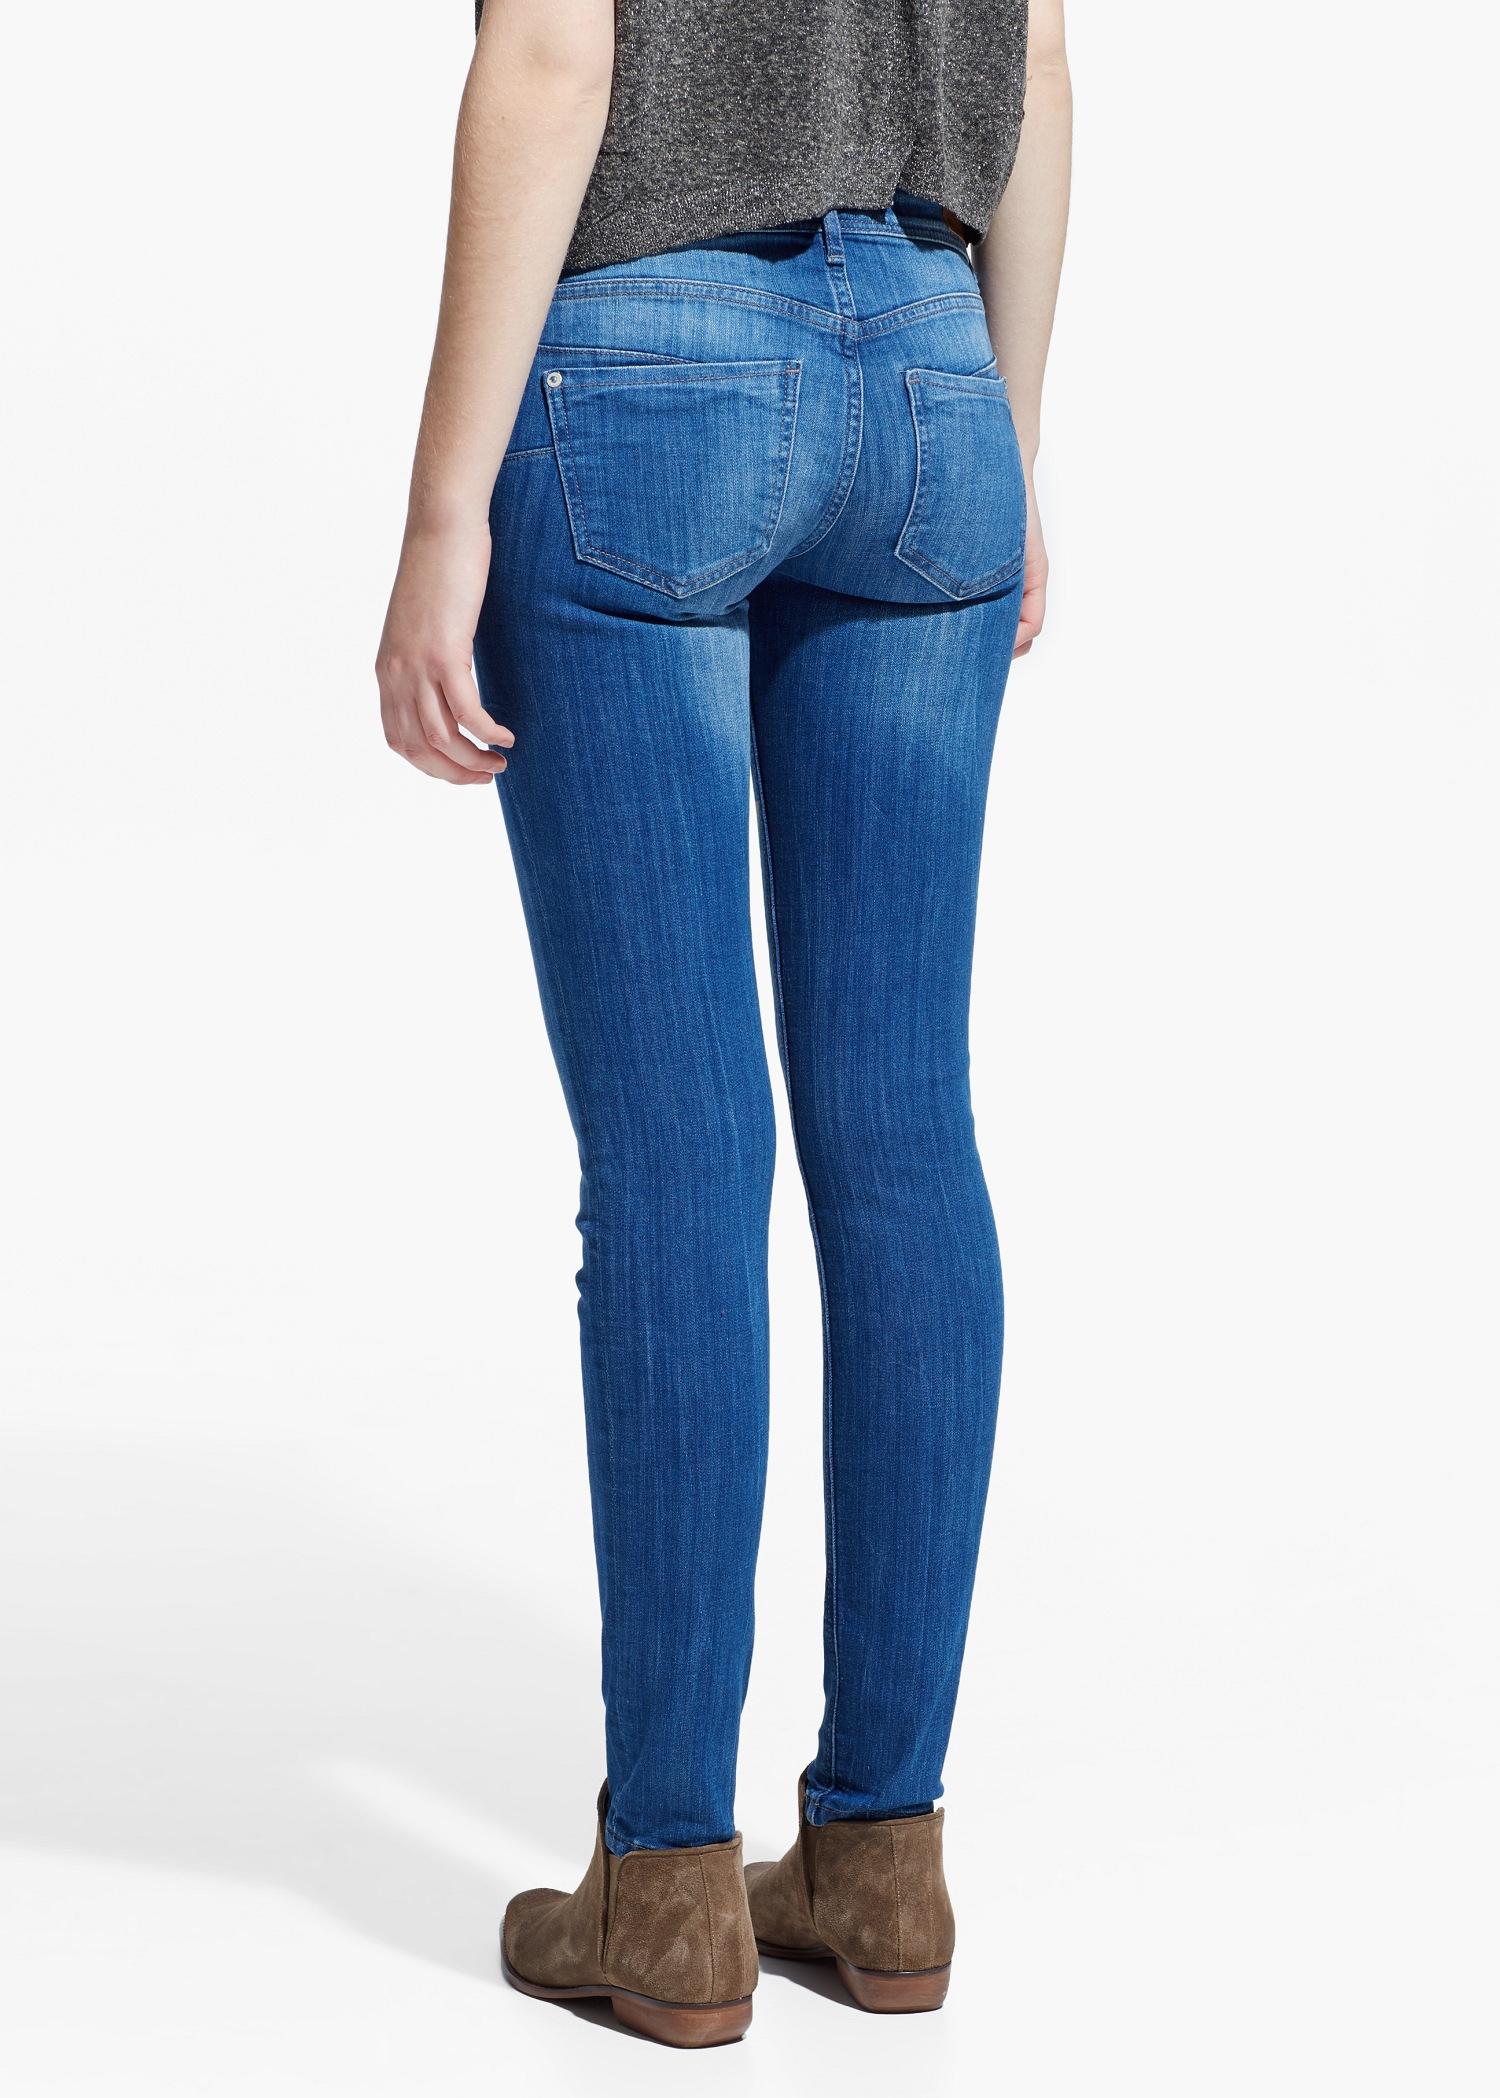 Luxury Mid Waist Women Skinny Denim Jeans Package Hip Sexy Push Up Pants Slim TrouserF7